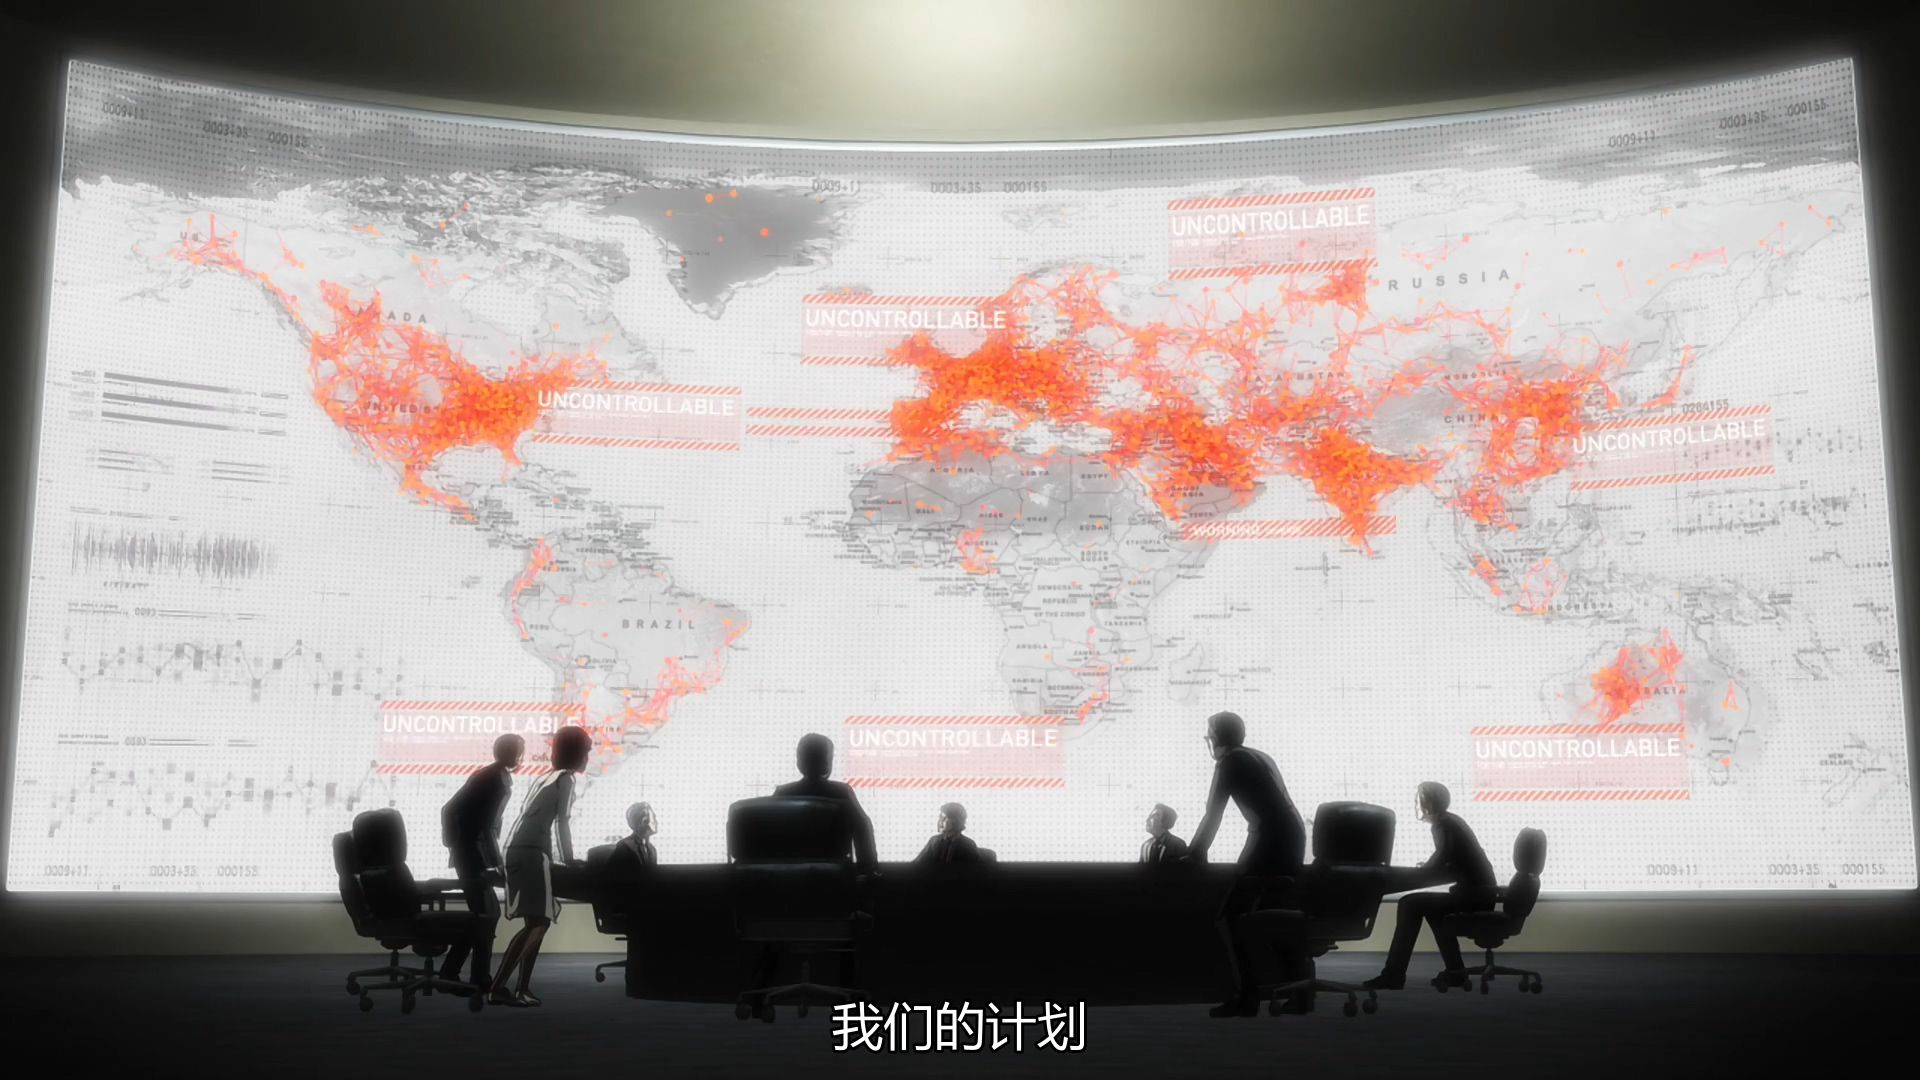 图29-2 ep10 全球 GG